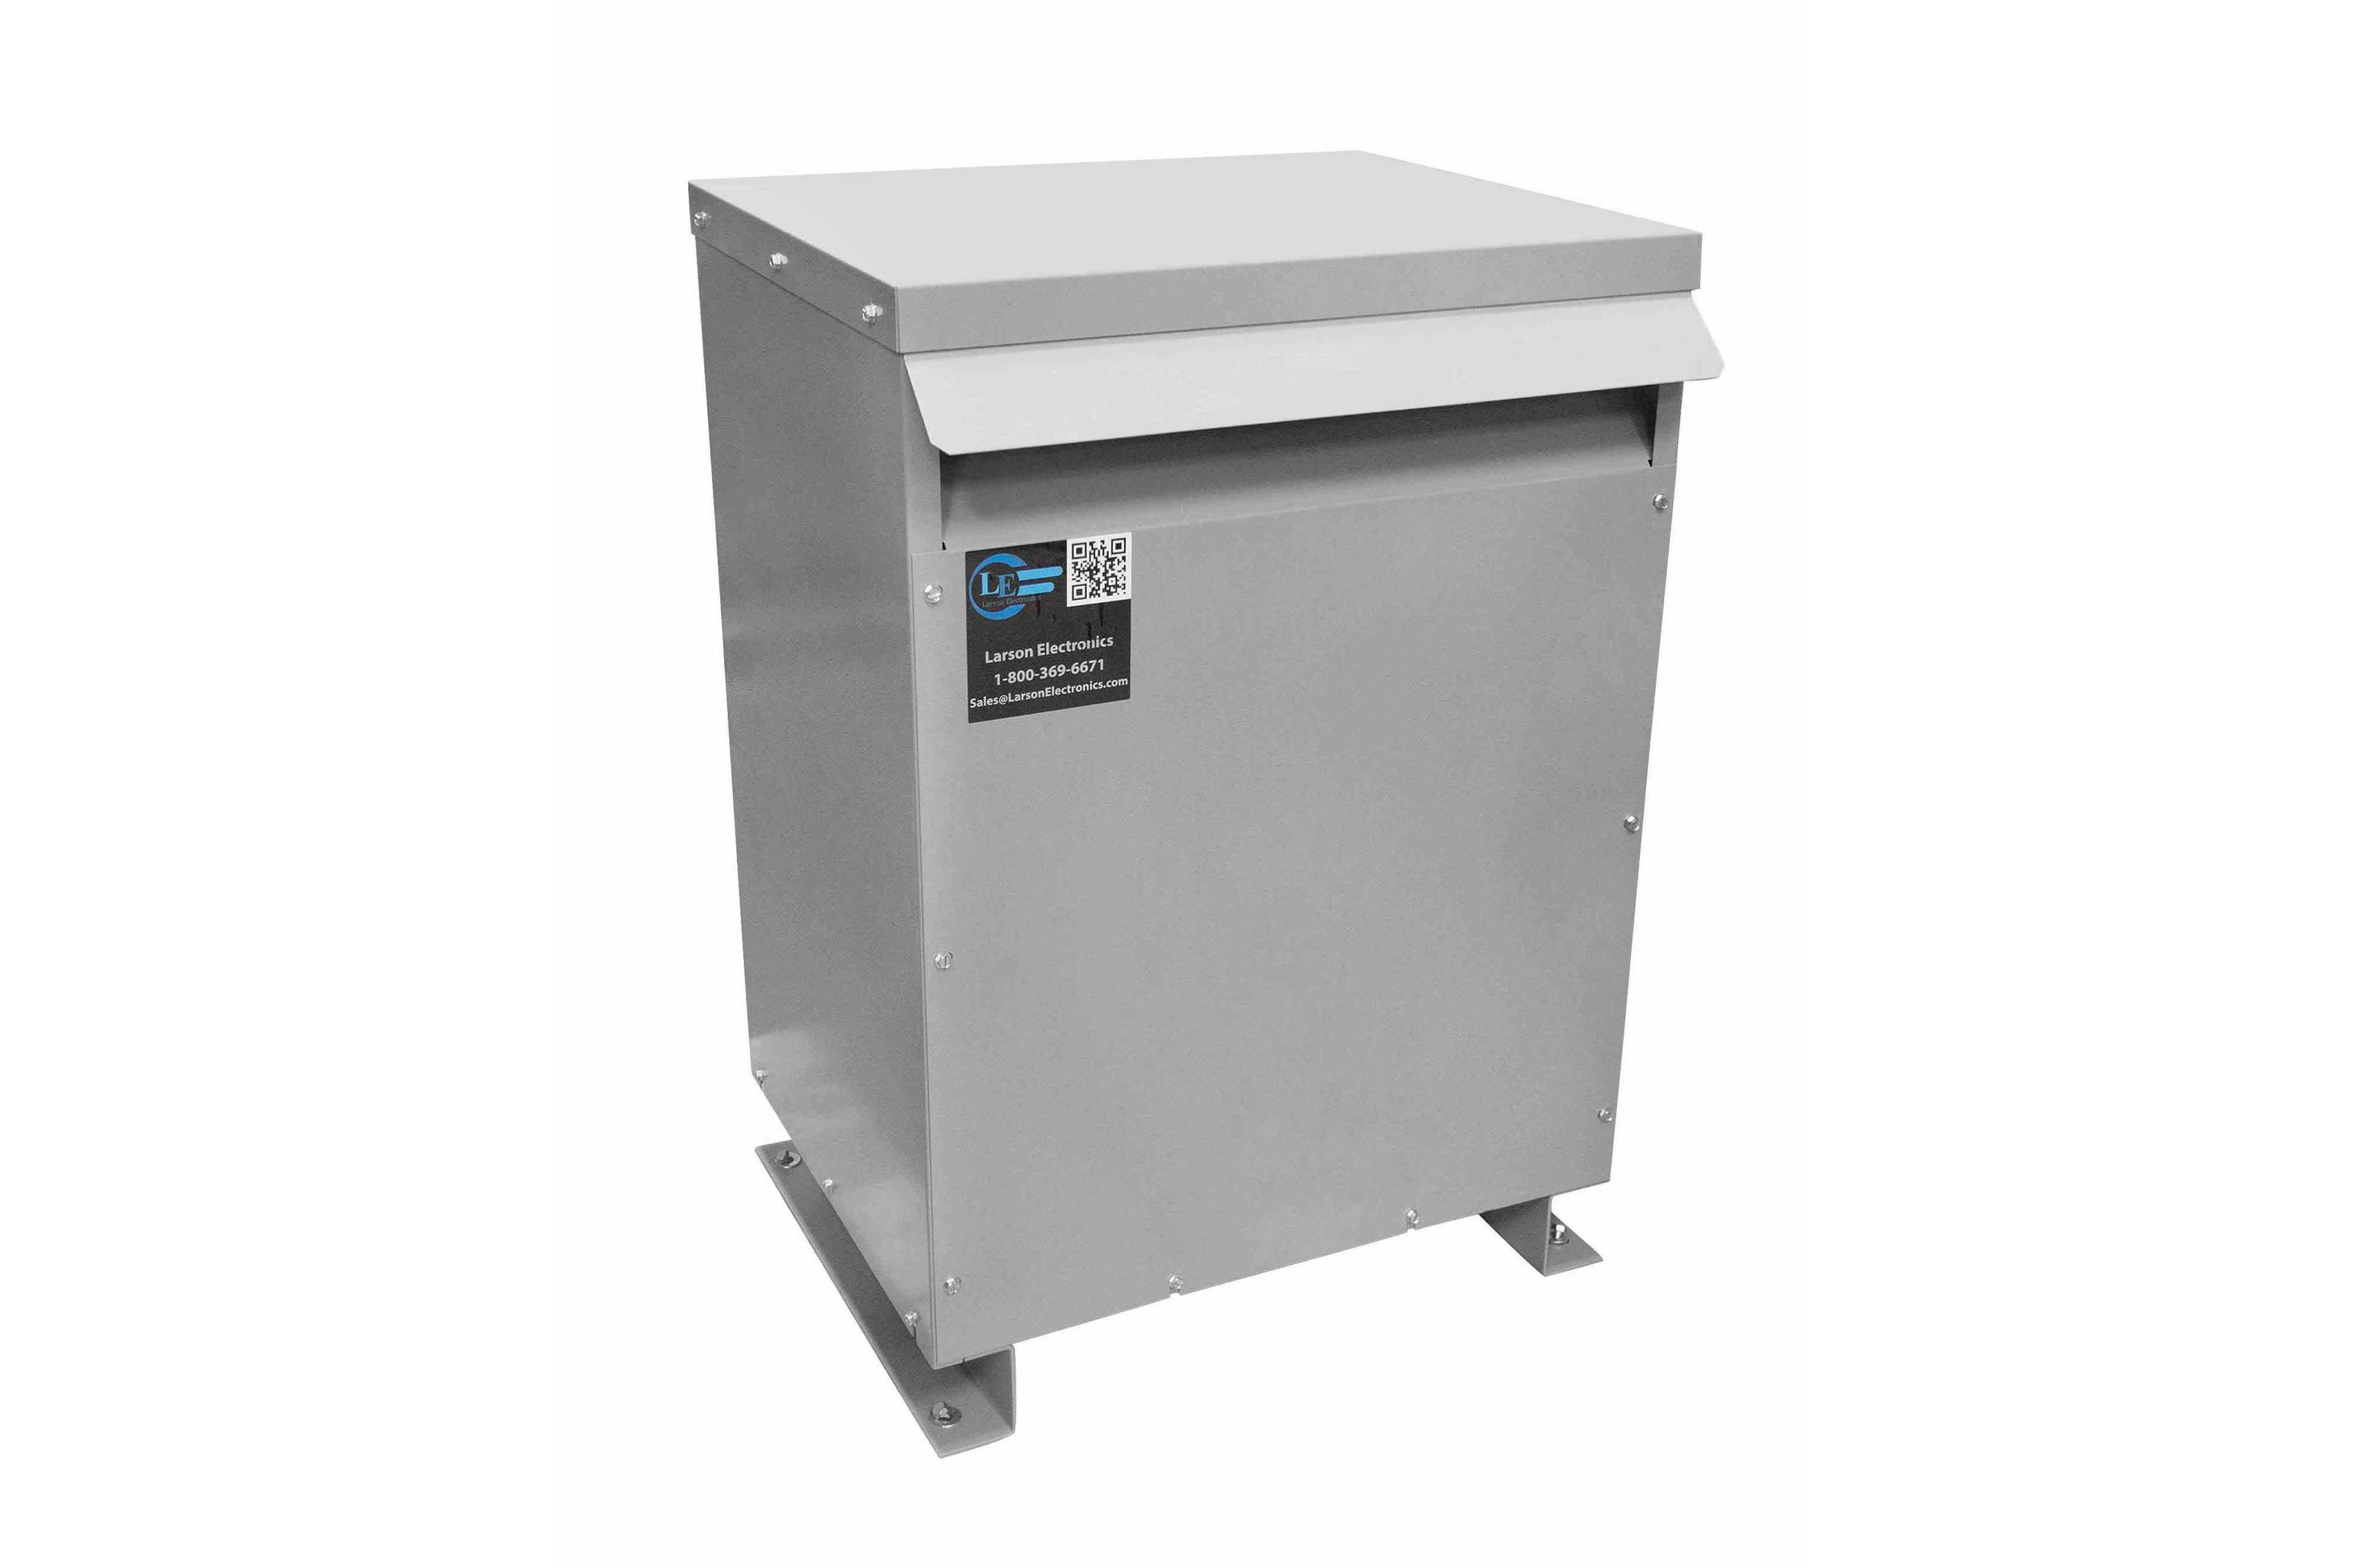 37.5 kVA 3PH Isolation Transformer, 480V Wye Primary, 208V Delta Secondary, N3R, Ventilated, 60 Hz